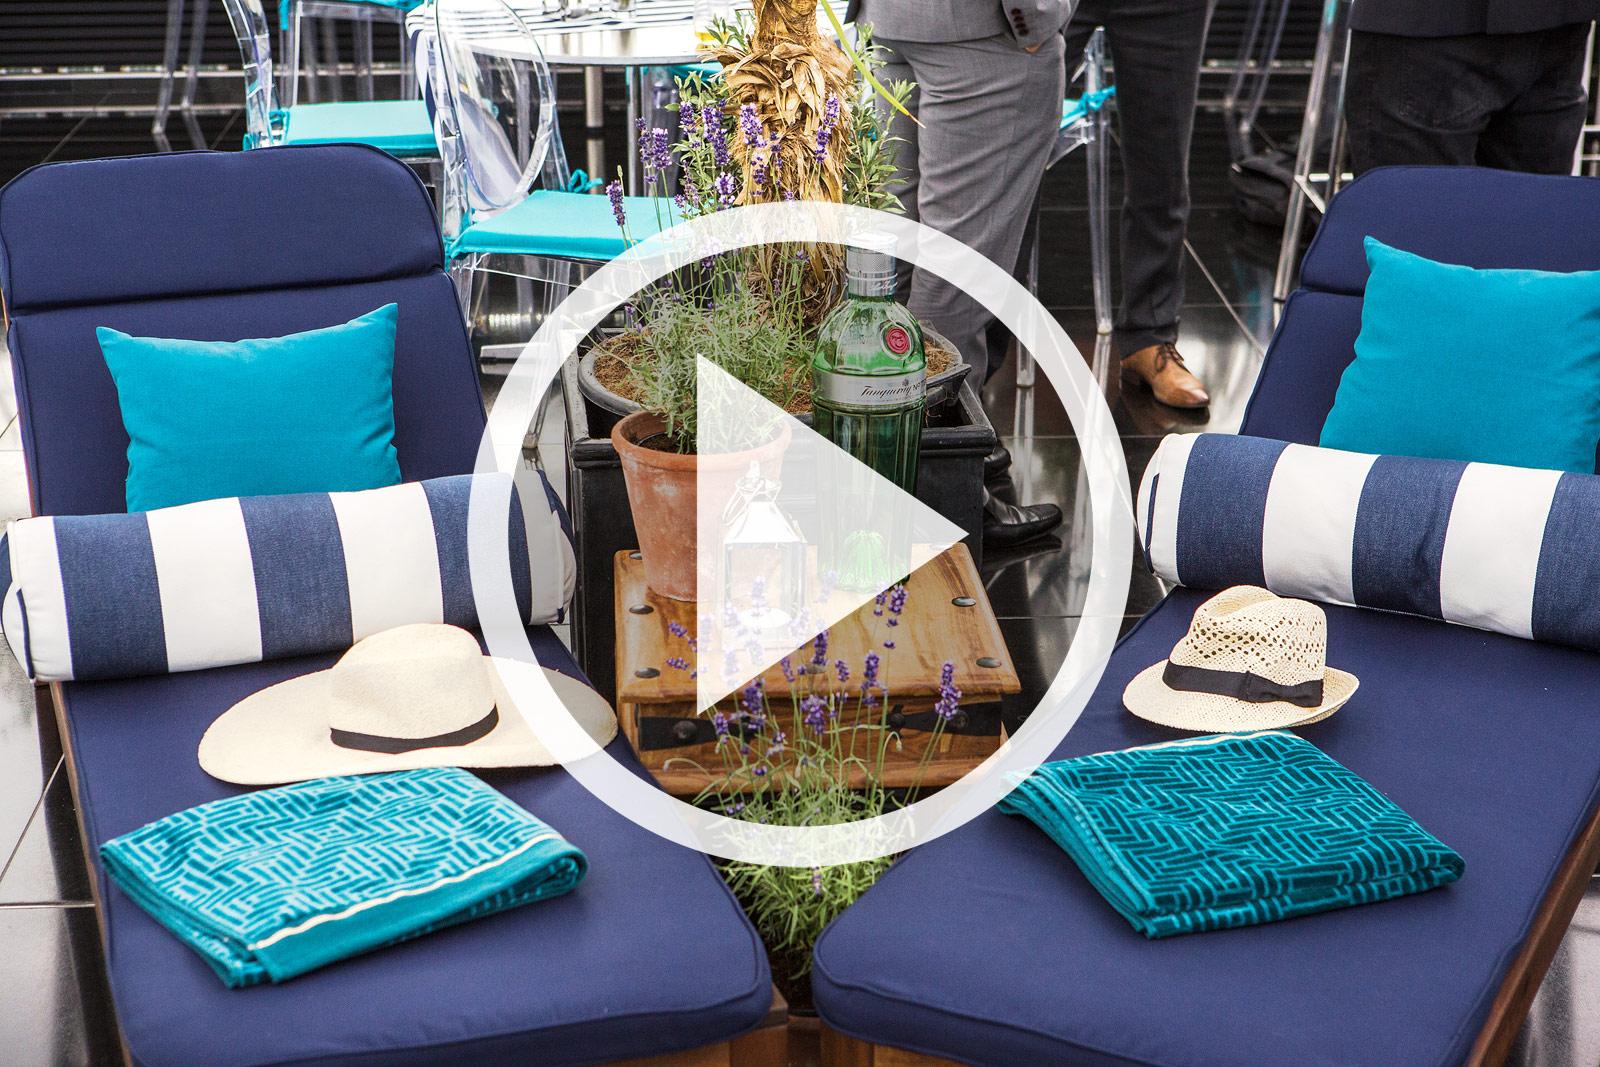 A short video of Searcys Summer Sky Riviera Bar